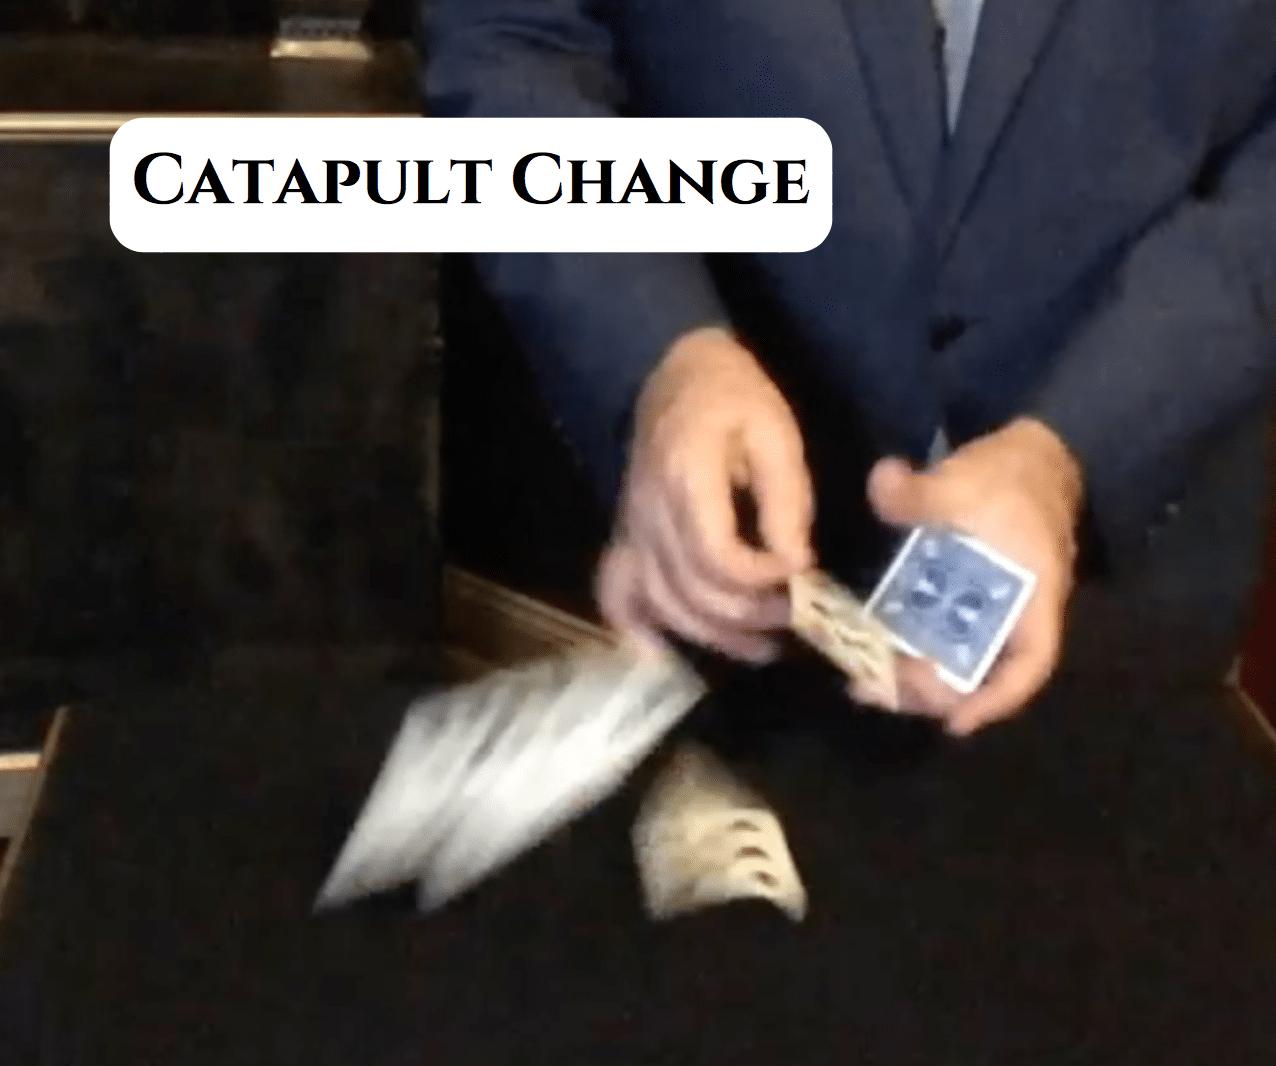 Catapult Change